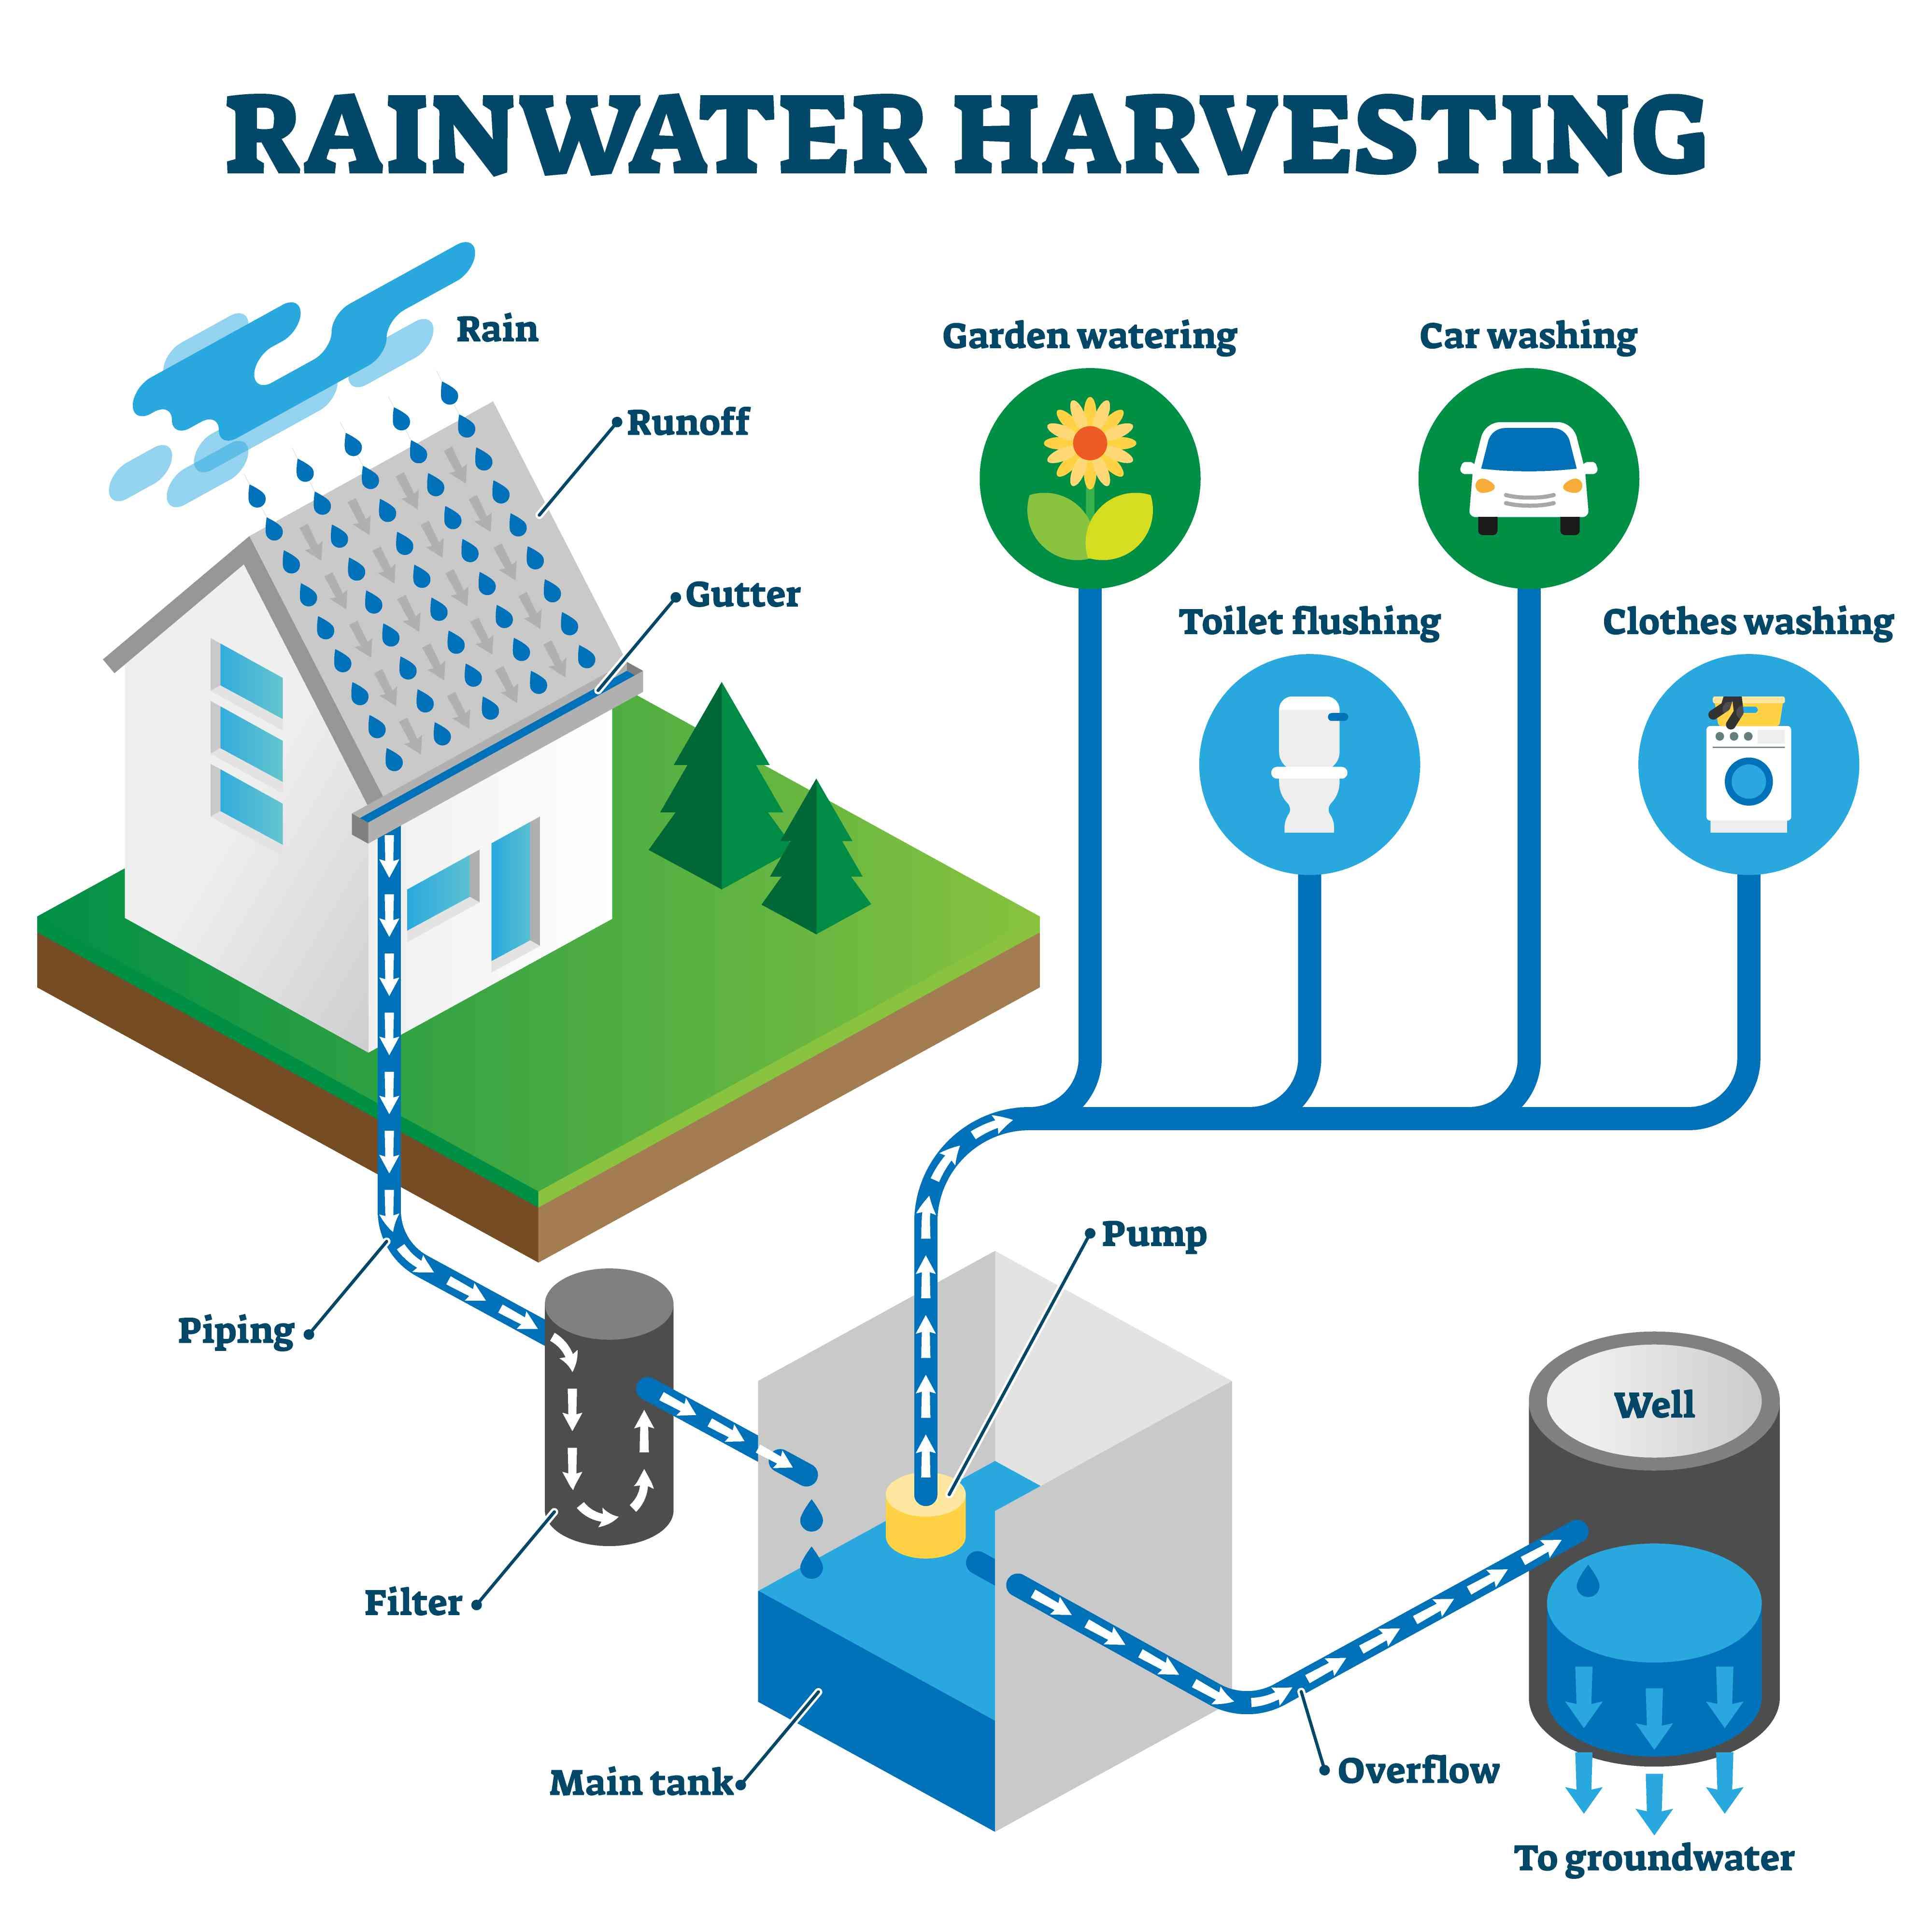 Rainwater harvesting system isometric diagram